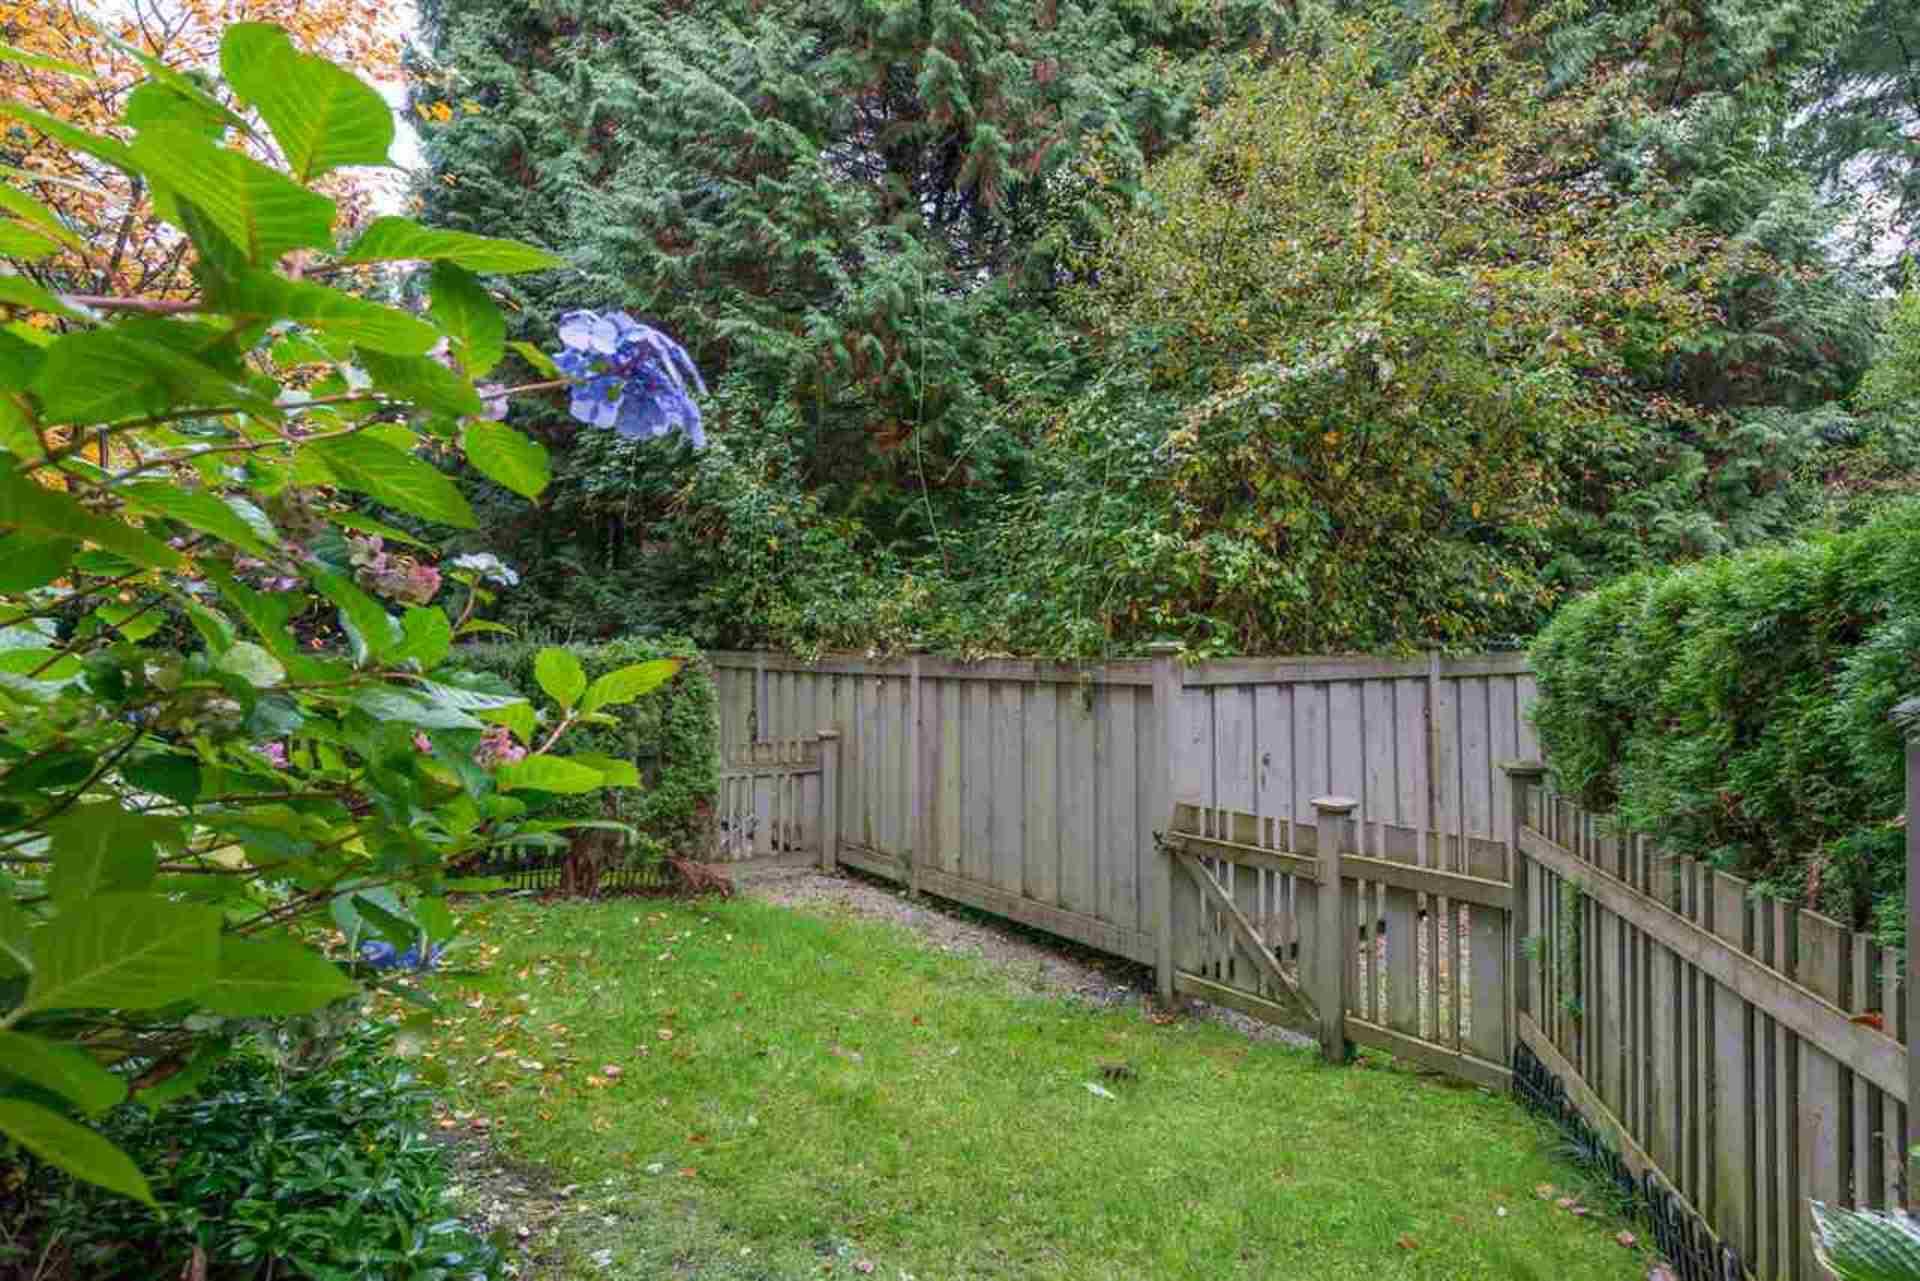 1111-e-27th-street-lynn-valley-north-vancouver-16 at 113 - 1111 E 27th Street, Lynn Valley, North Vancouver